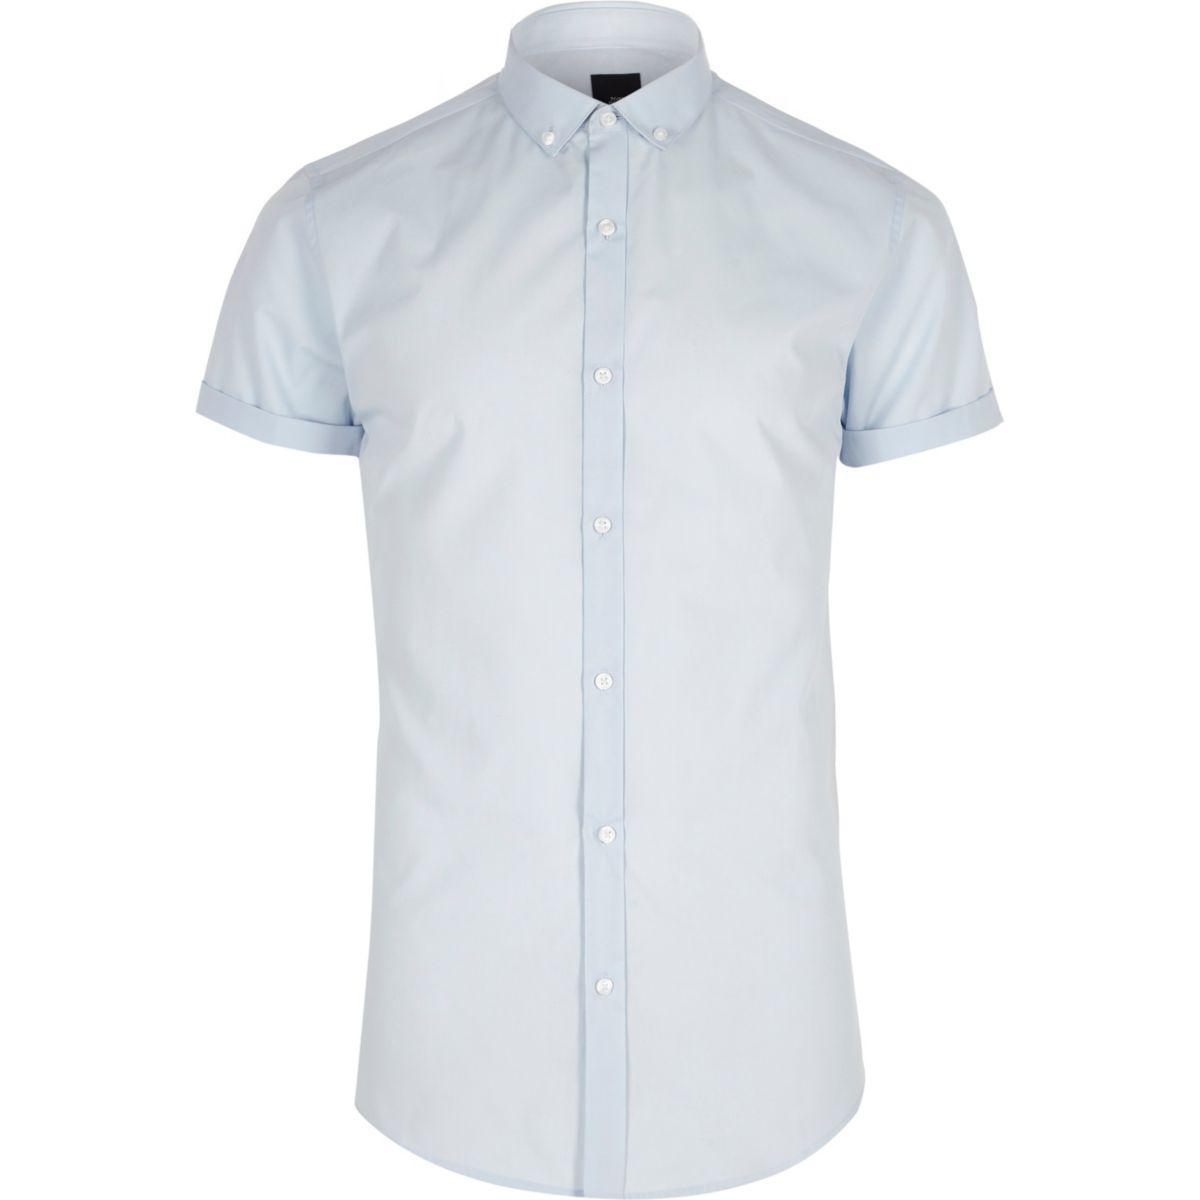 Blauw slim-fit overhemd met korte mouwen en knoopsluiting